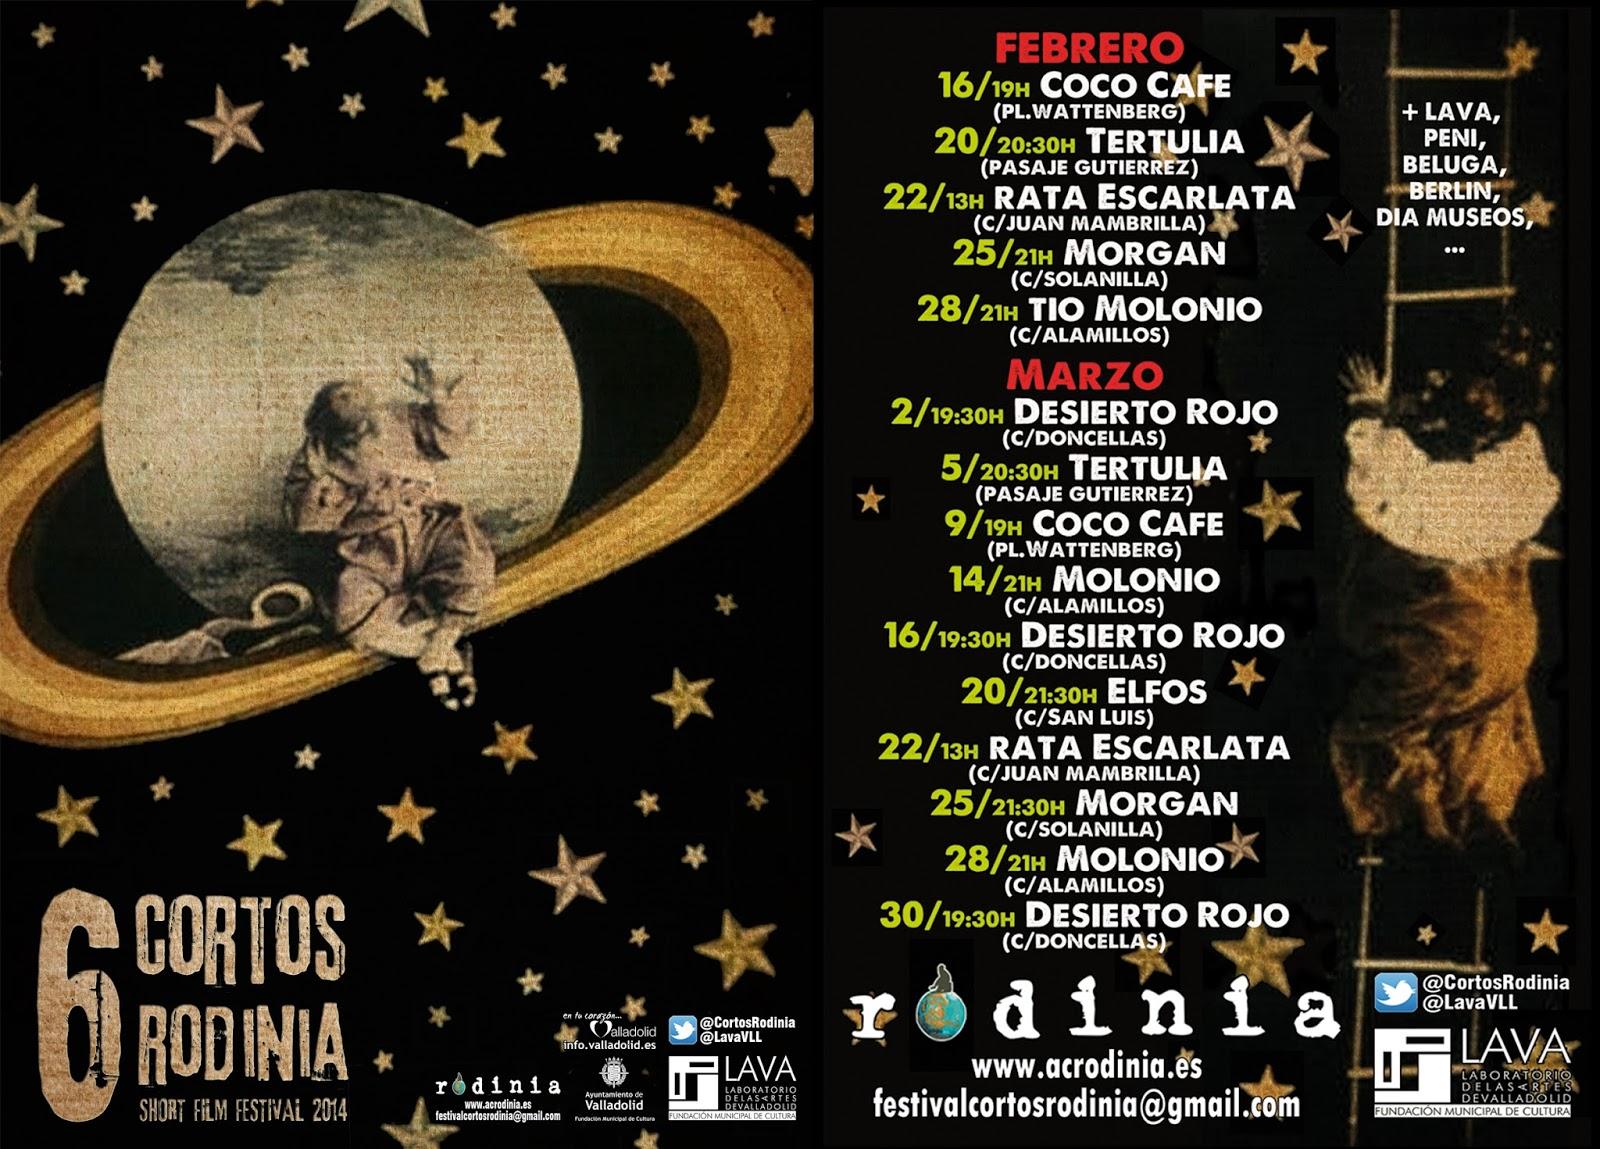 Festival Cortos Rodinia - Avance